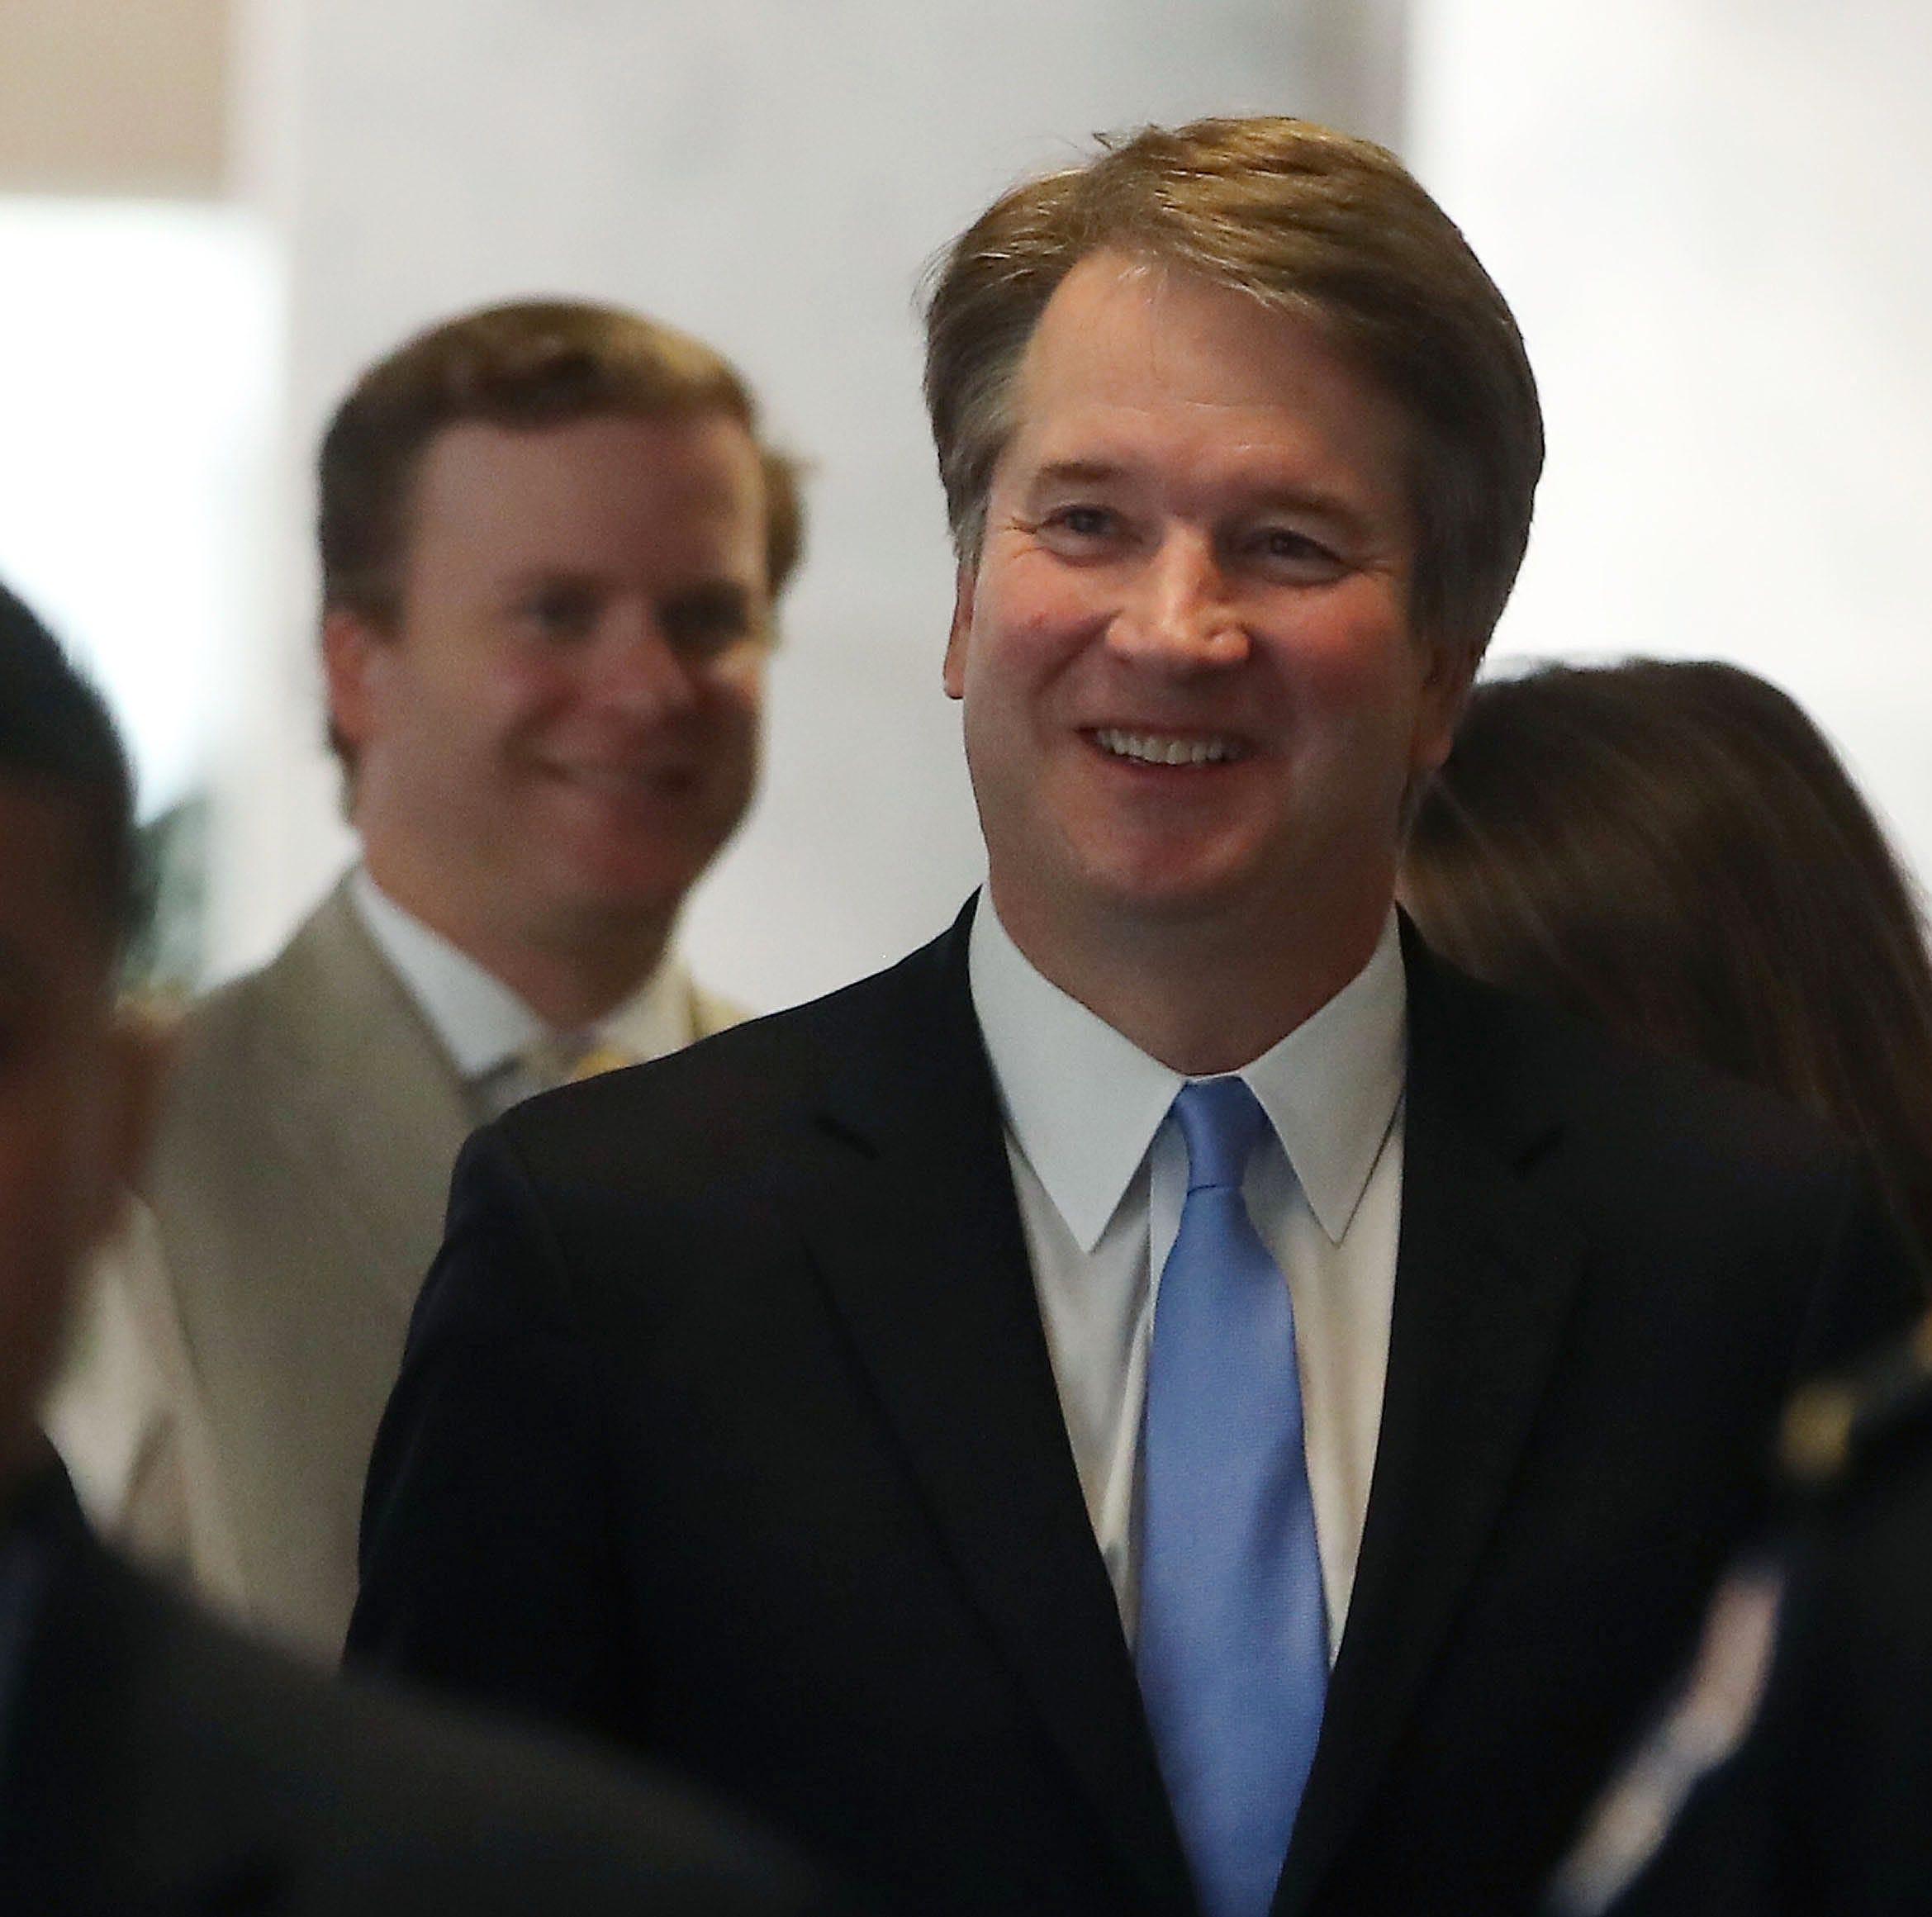 Kavanaugh confirmation vote should wait | Opinion